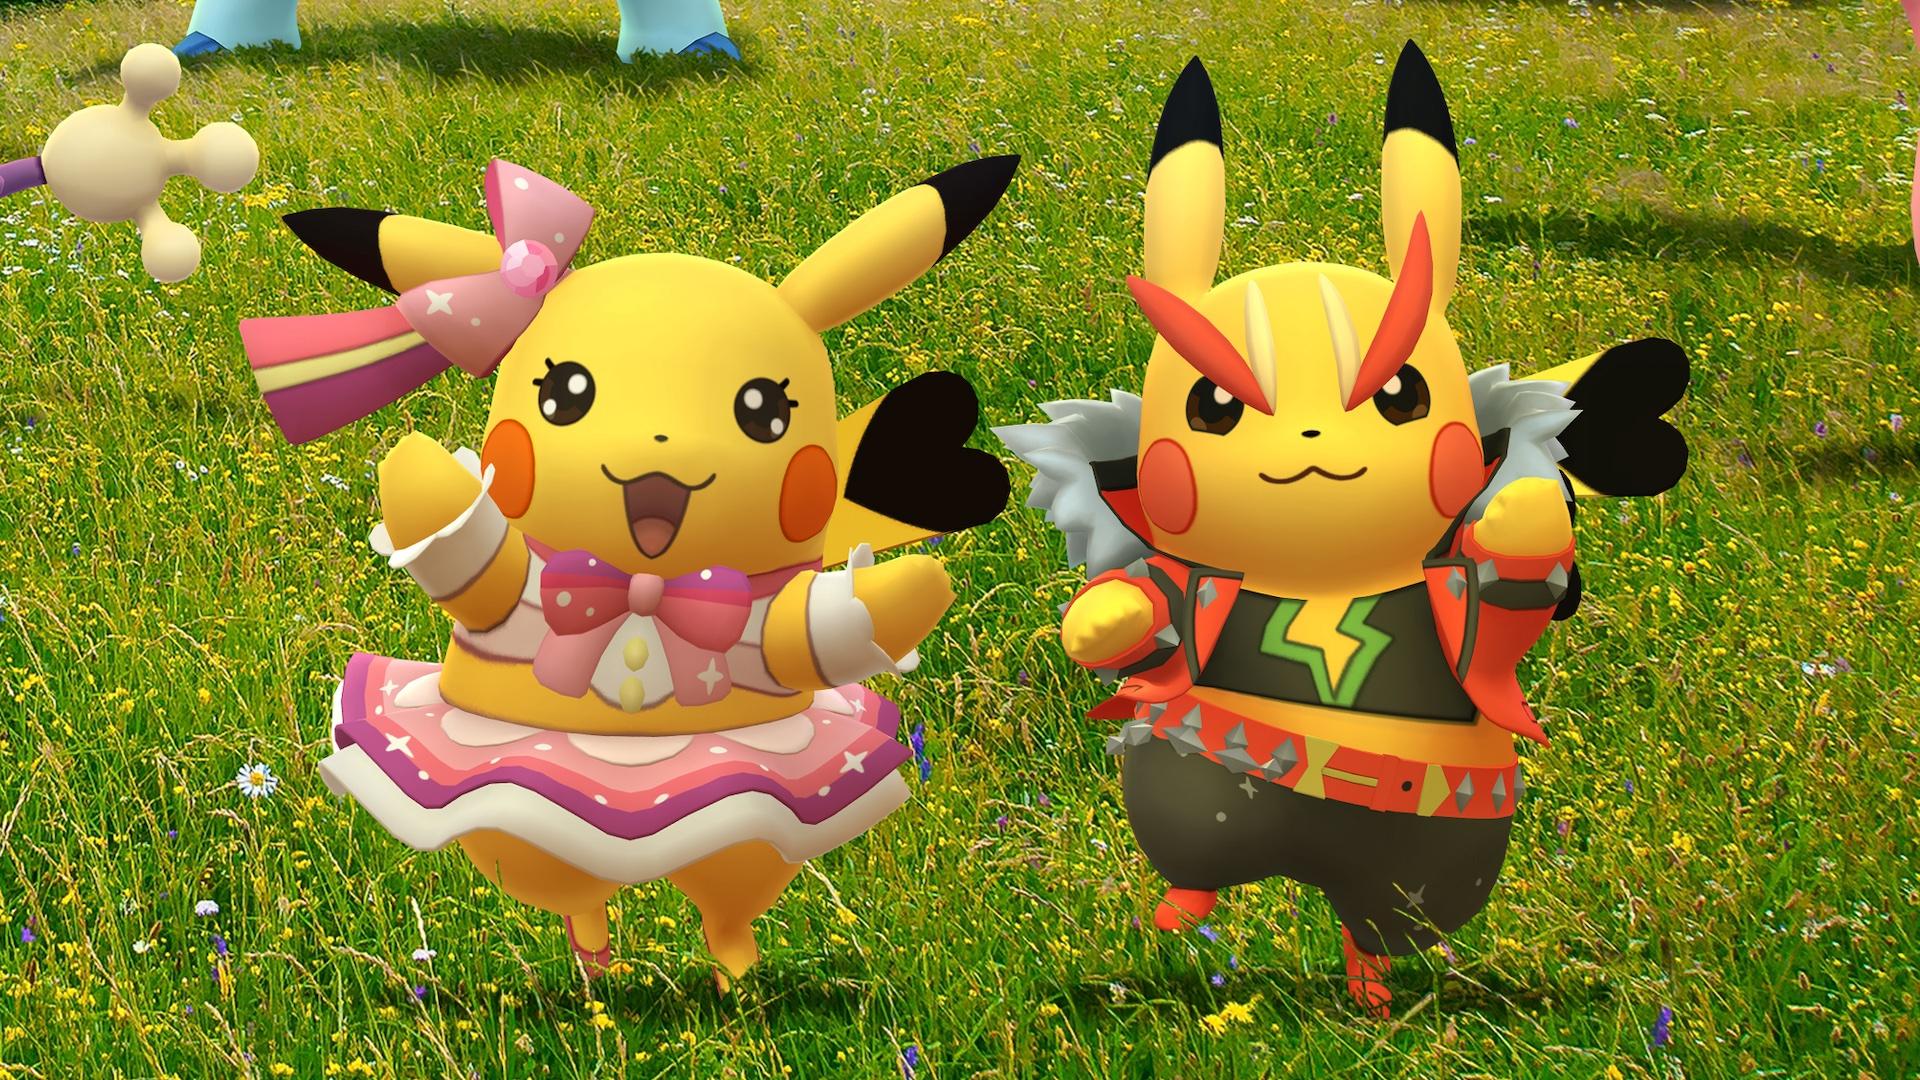 Pikachu Pop Star and Pikachu Rock Star dance in a field in artwork for Pokémon Go Fest 2021